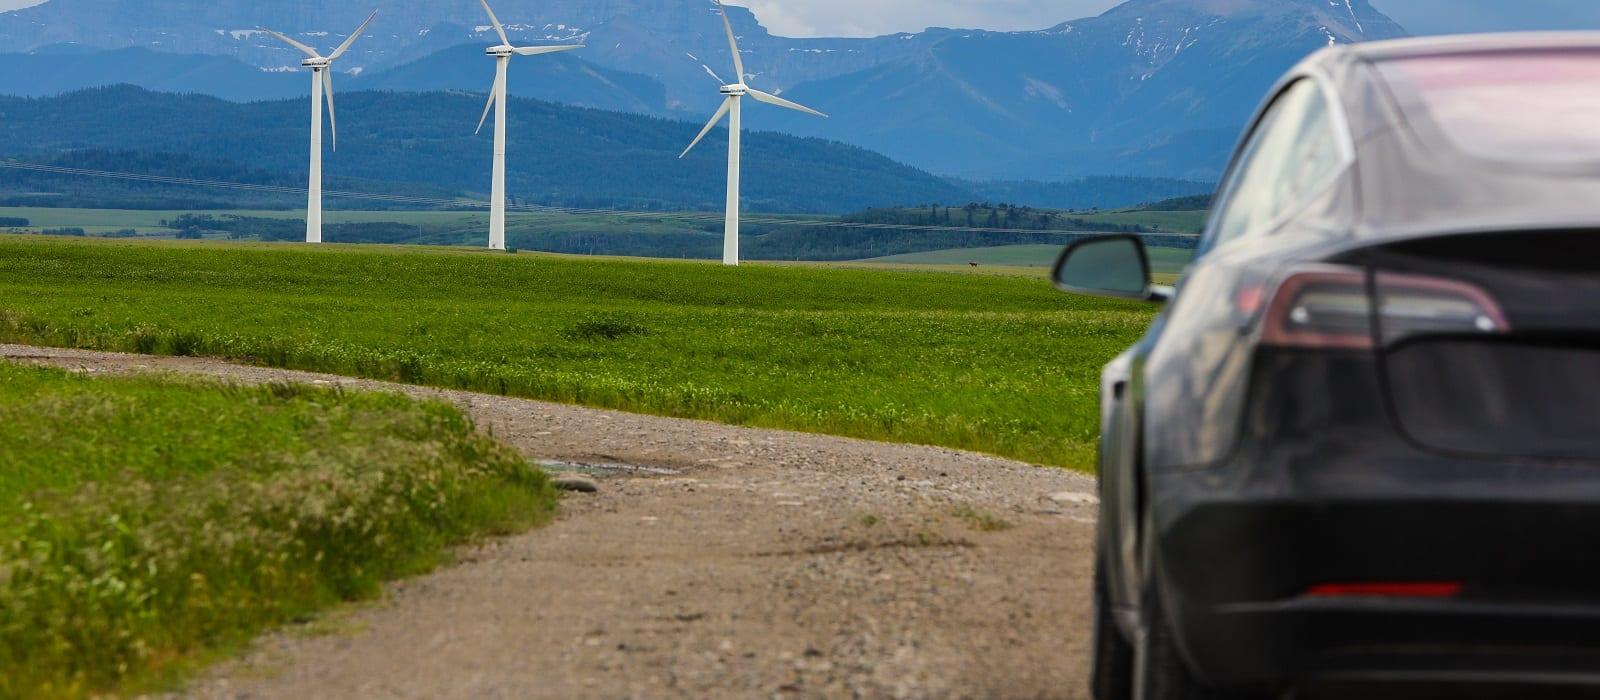 My Tesla Adventures Family Trip to Montana USA. Photo Credit: Sergei Belski